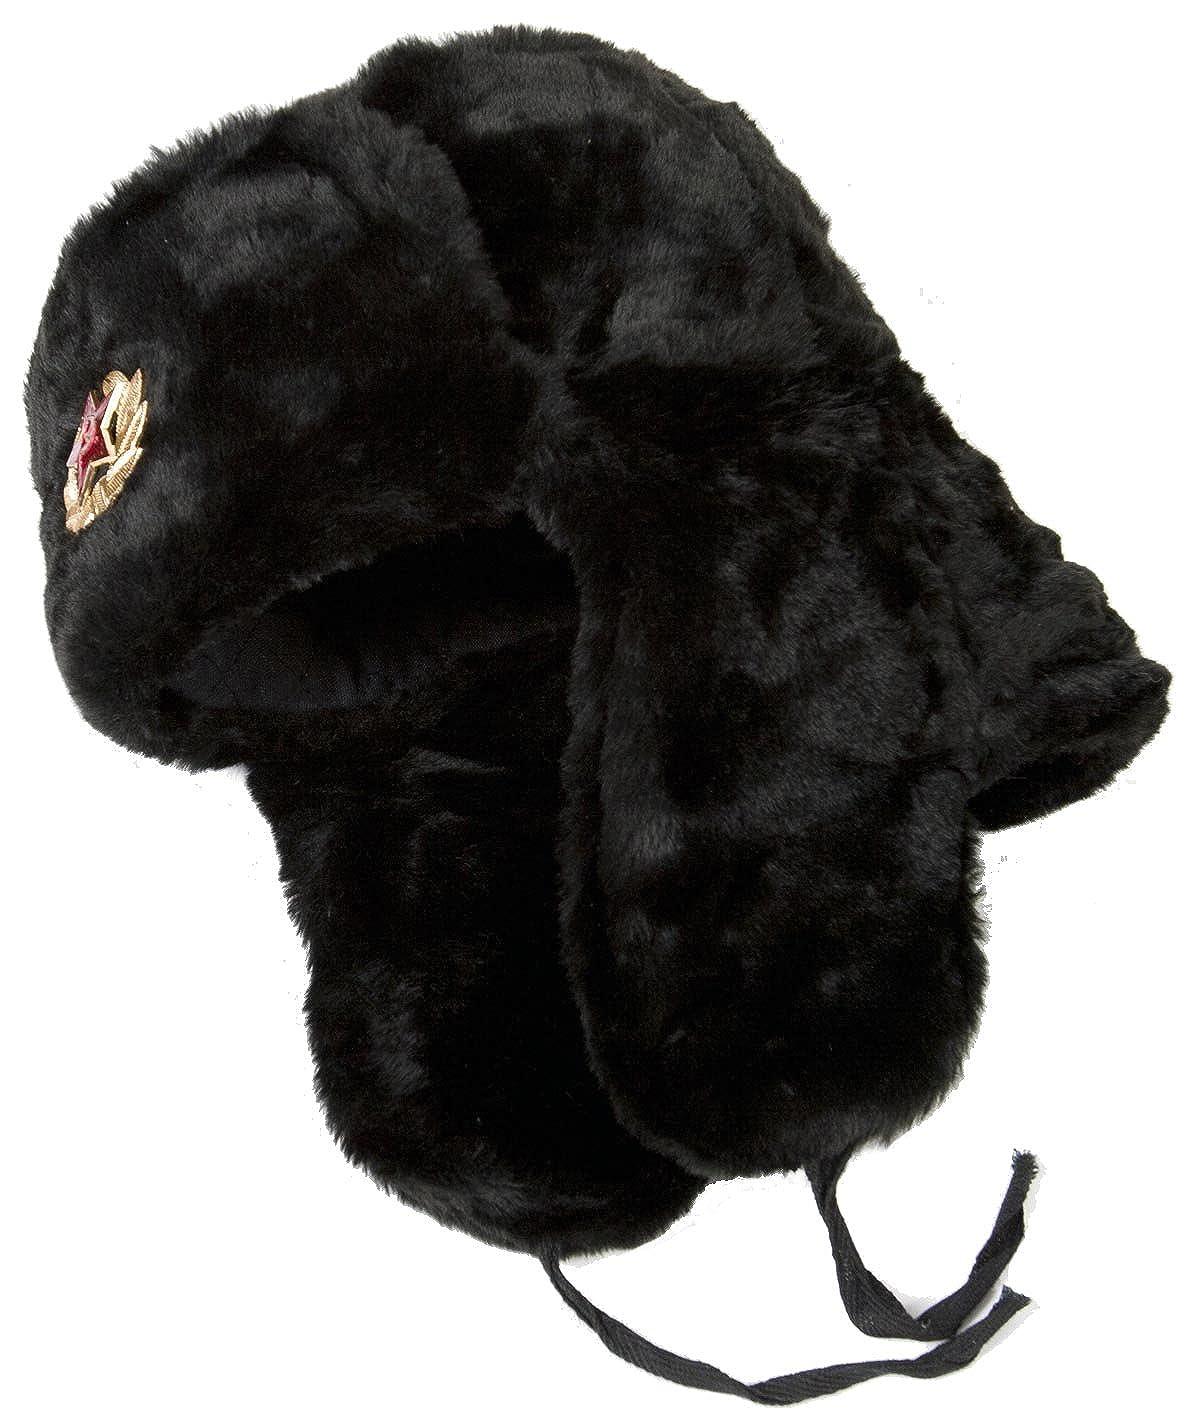 e3102af13 Hat Russian Soviet Army Black KGB Fur Military Cossack Ushanka Size L